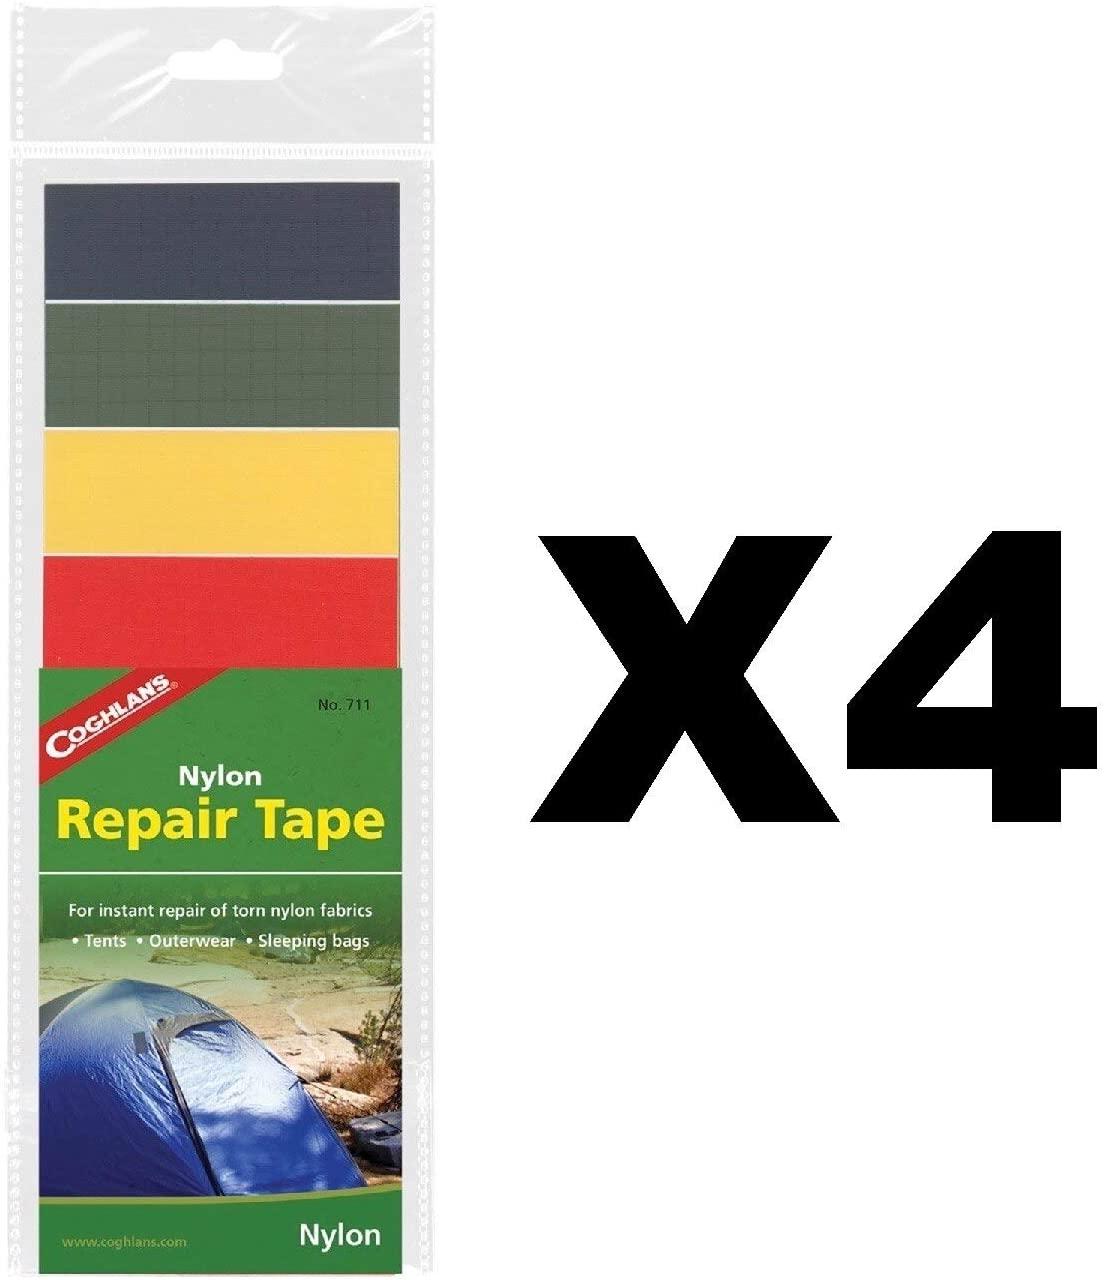 Coghlans 711 Nylon Repair Tape In Four Colors